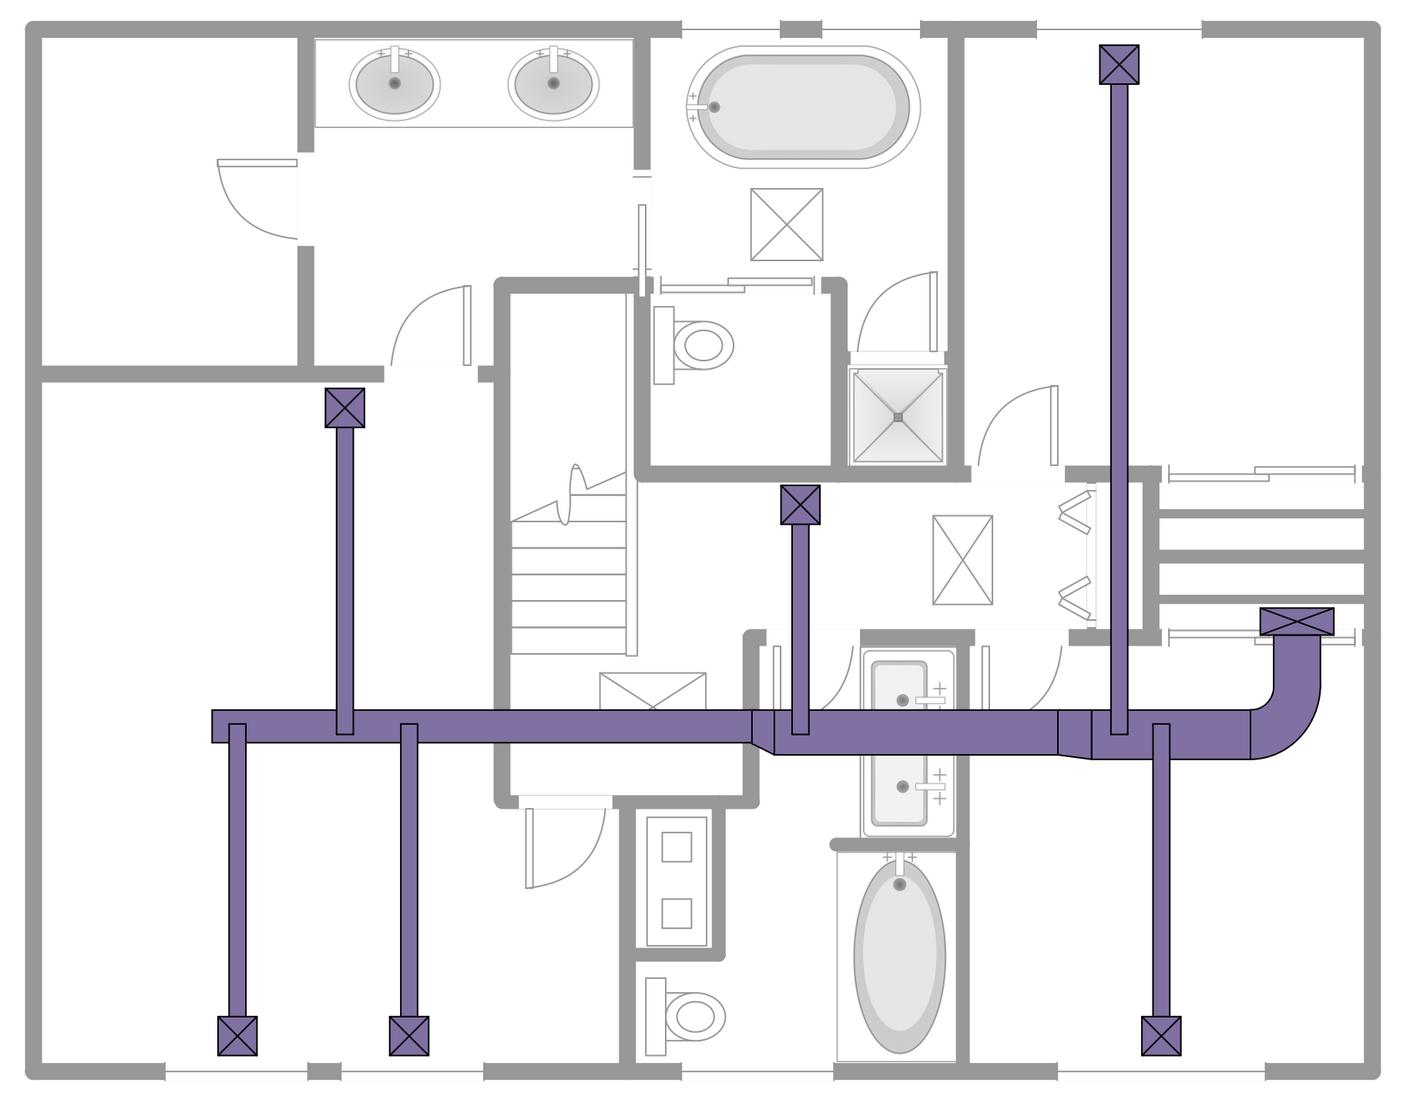 Typical Wiring Diagram Hvac Unit Ventilator : 43 Wiring